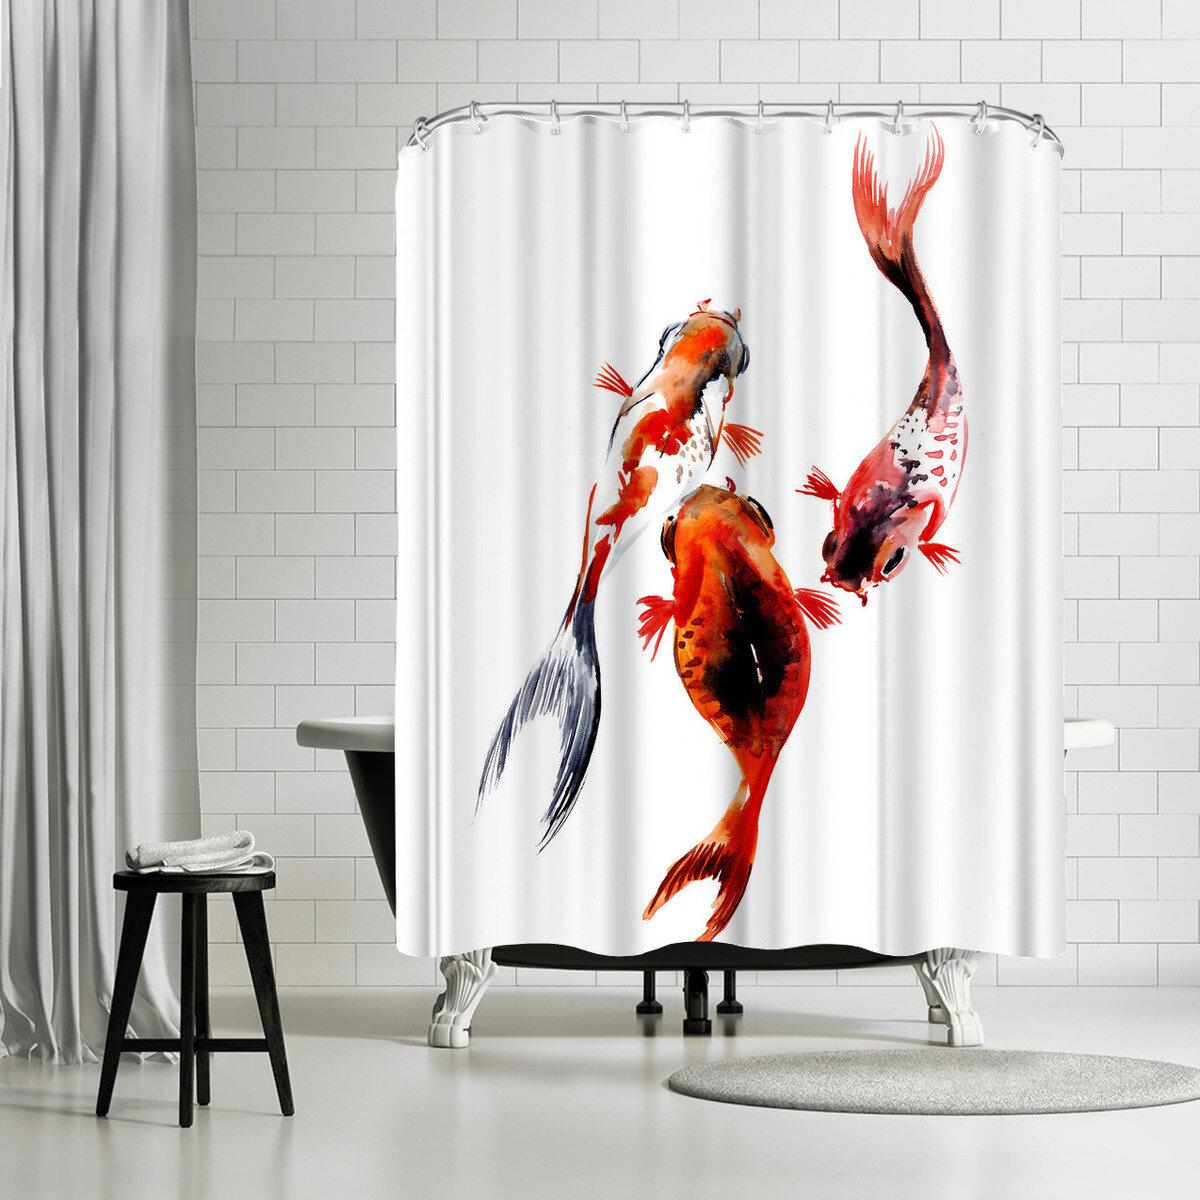 East Urban Home Suren Nersisyan Koi Fish Pond 2 1 Single Shower Curtain Wayfair